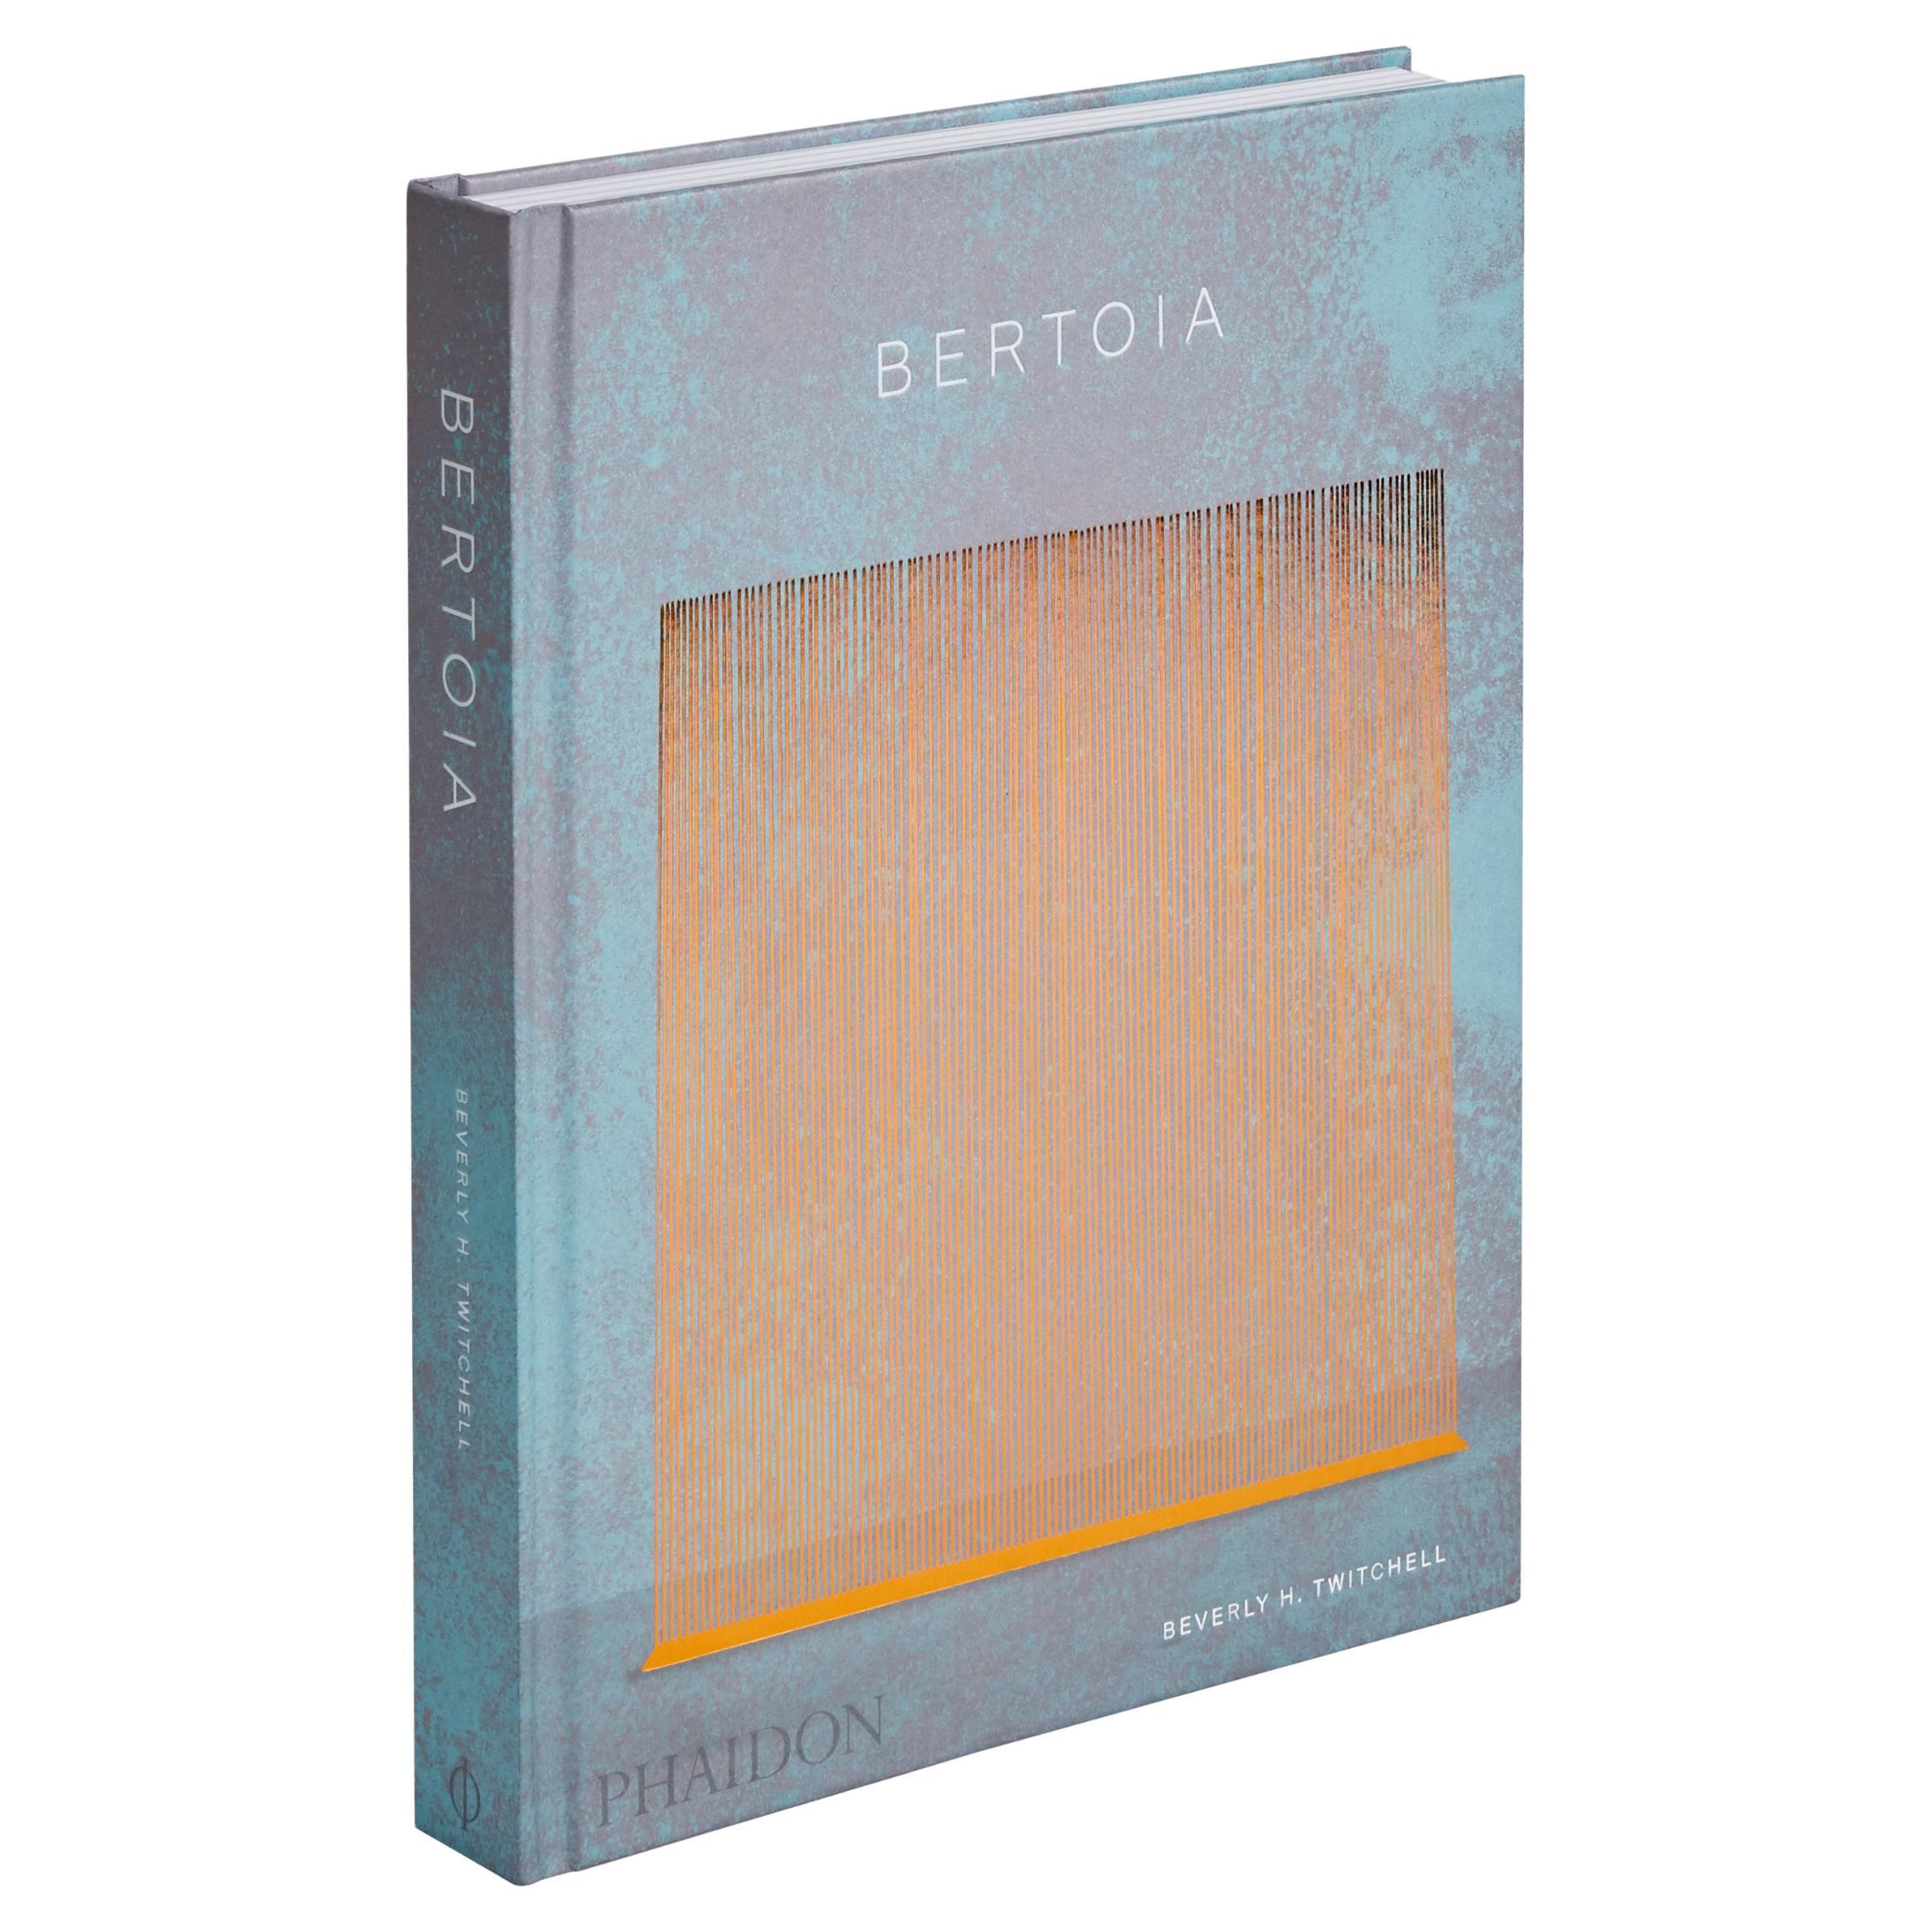 Bertoia, The Metal Worker Book